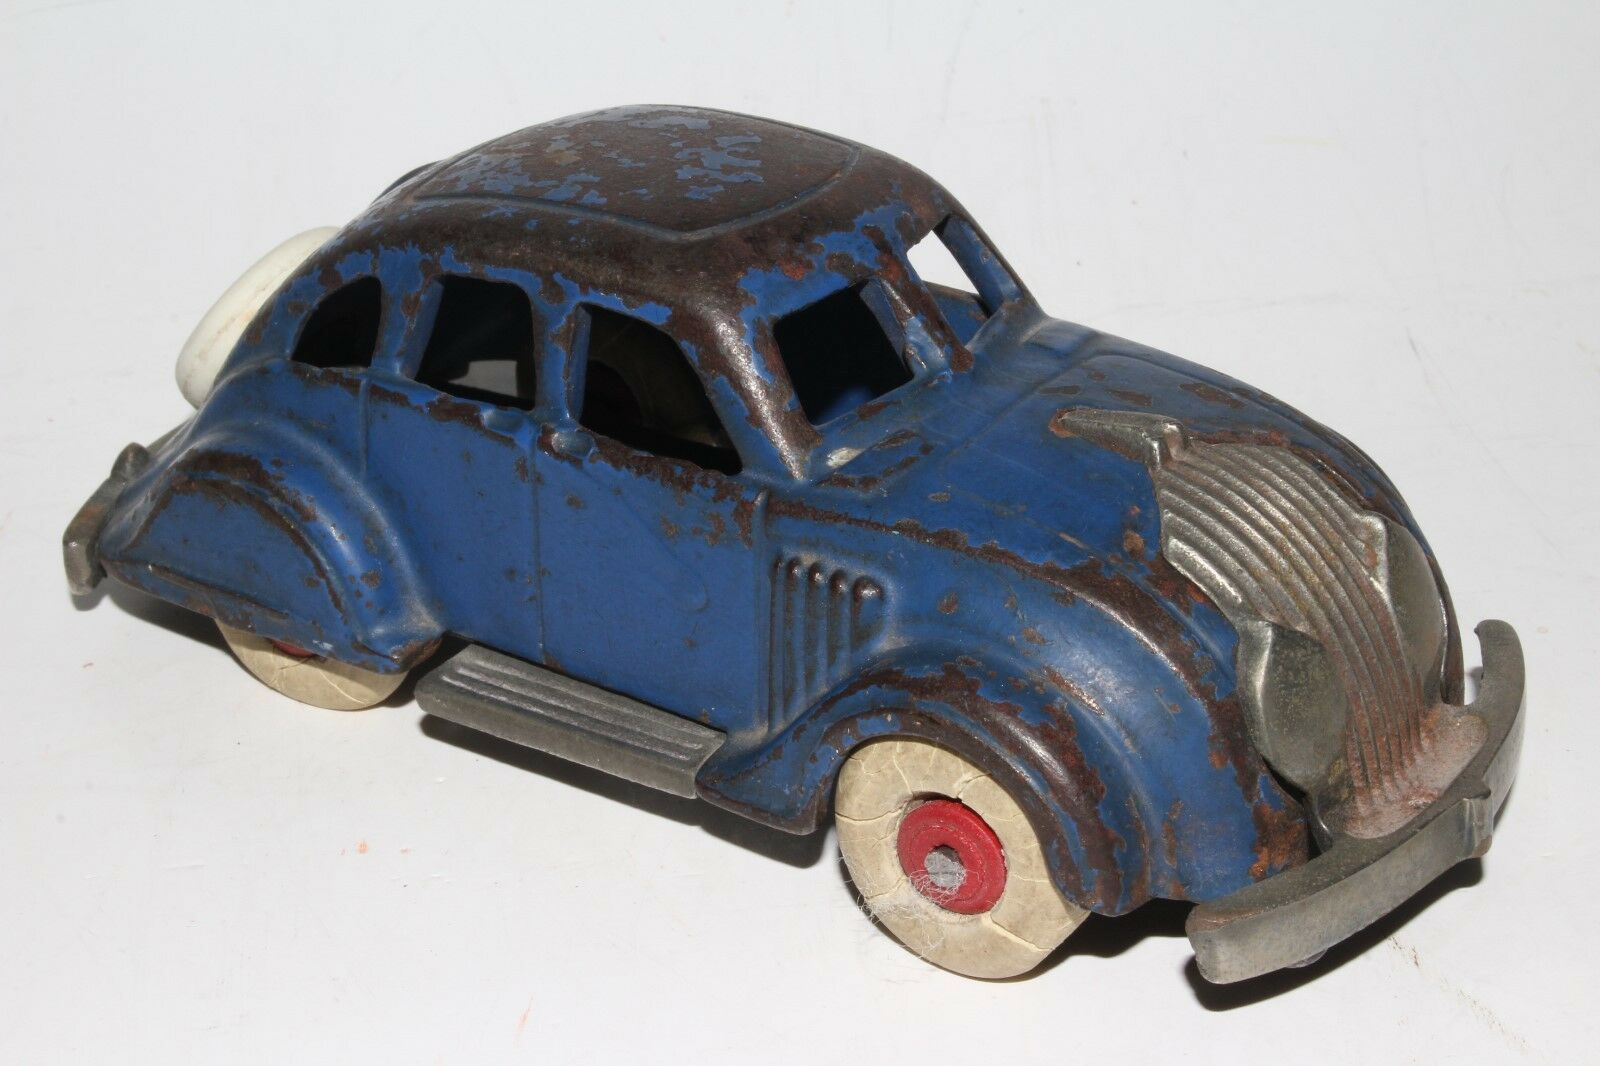 Hubley 1930's Cast Iron Chrysler Airflåg Sedan, 6 tum version, Original